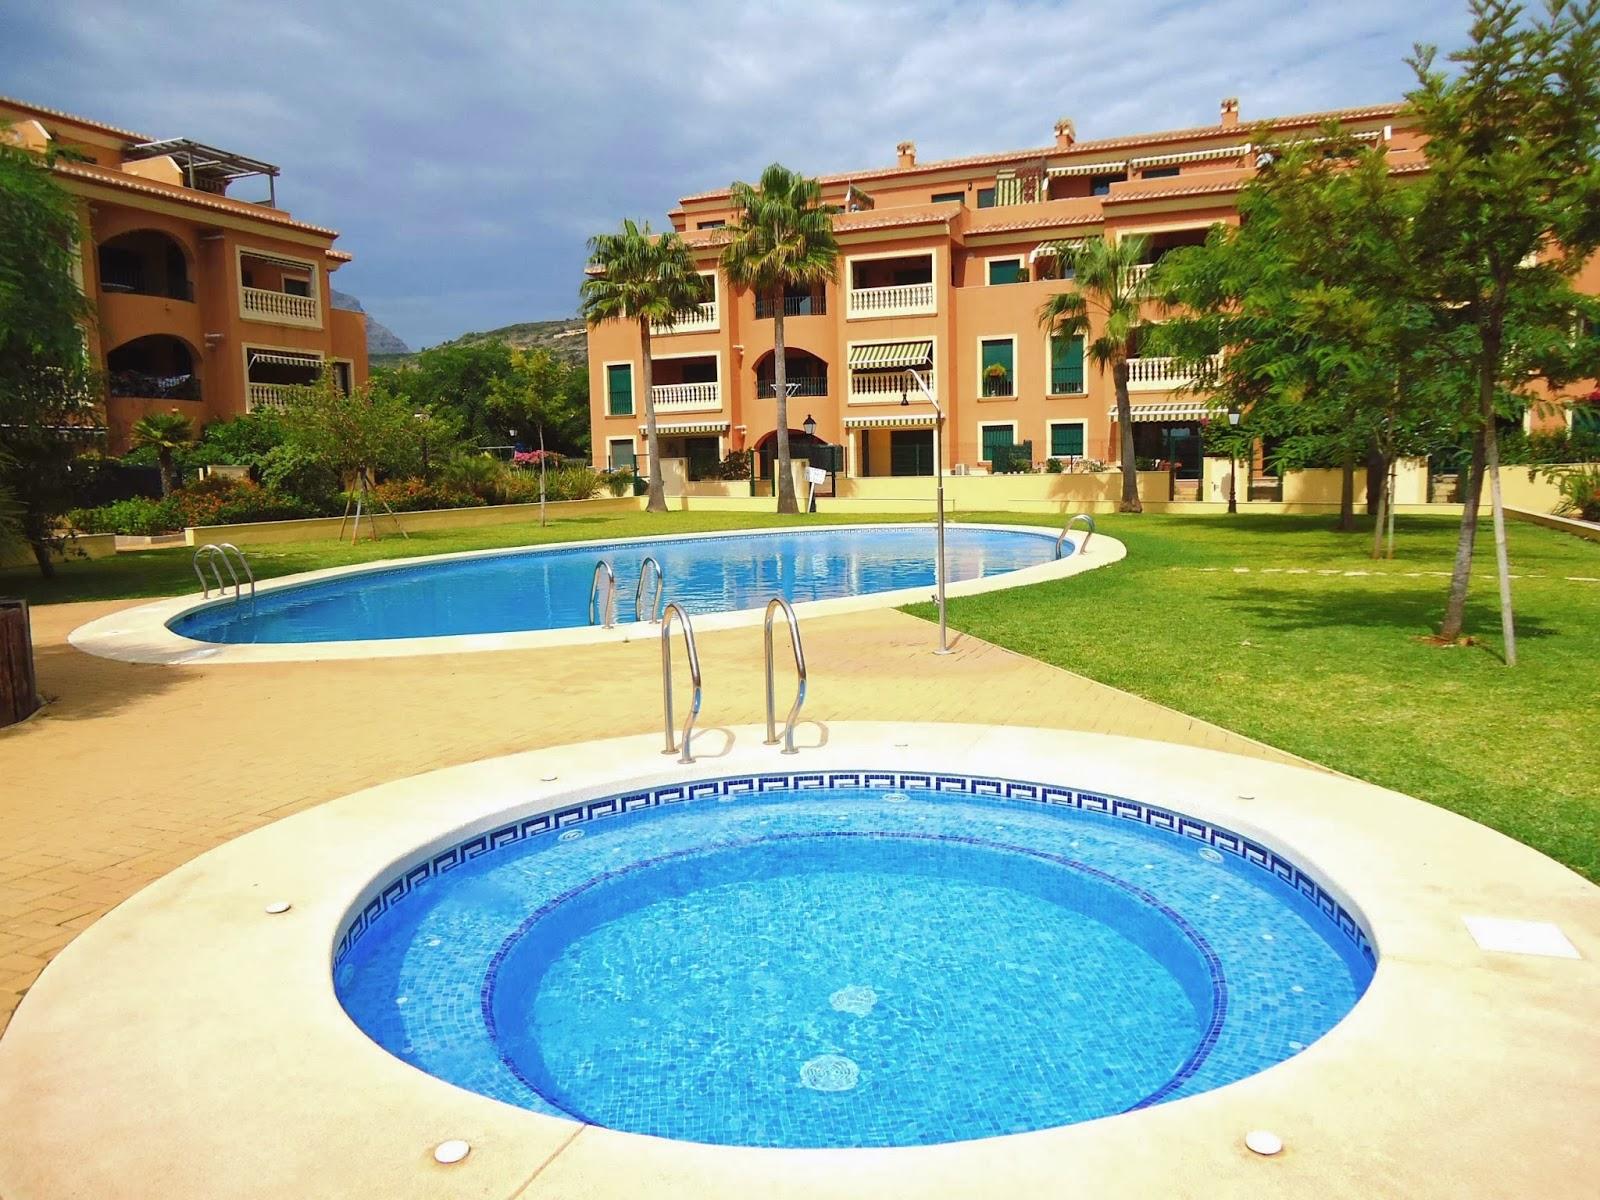 1600x1200 Spain holiday pool desktop PC and Mac wallpaper